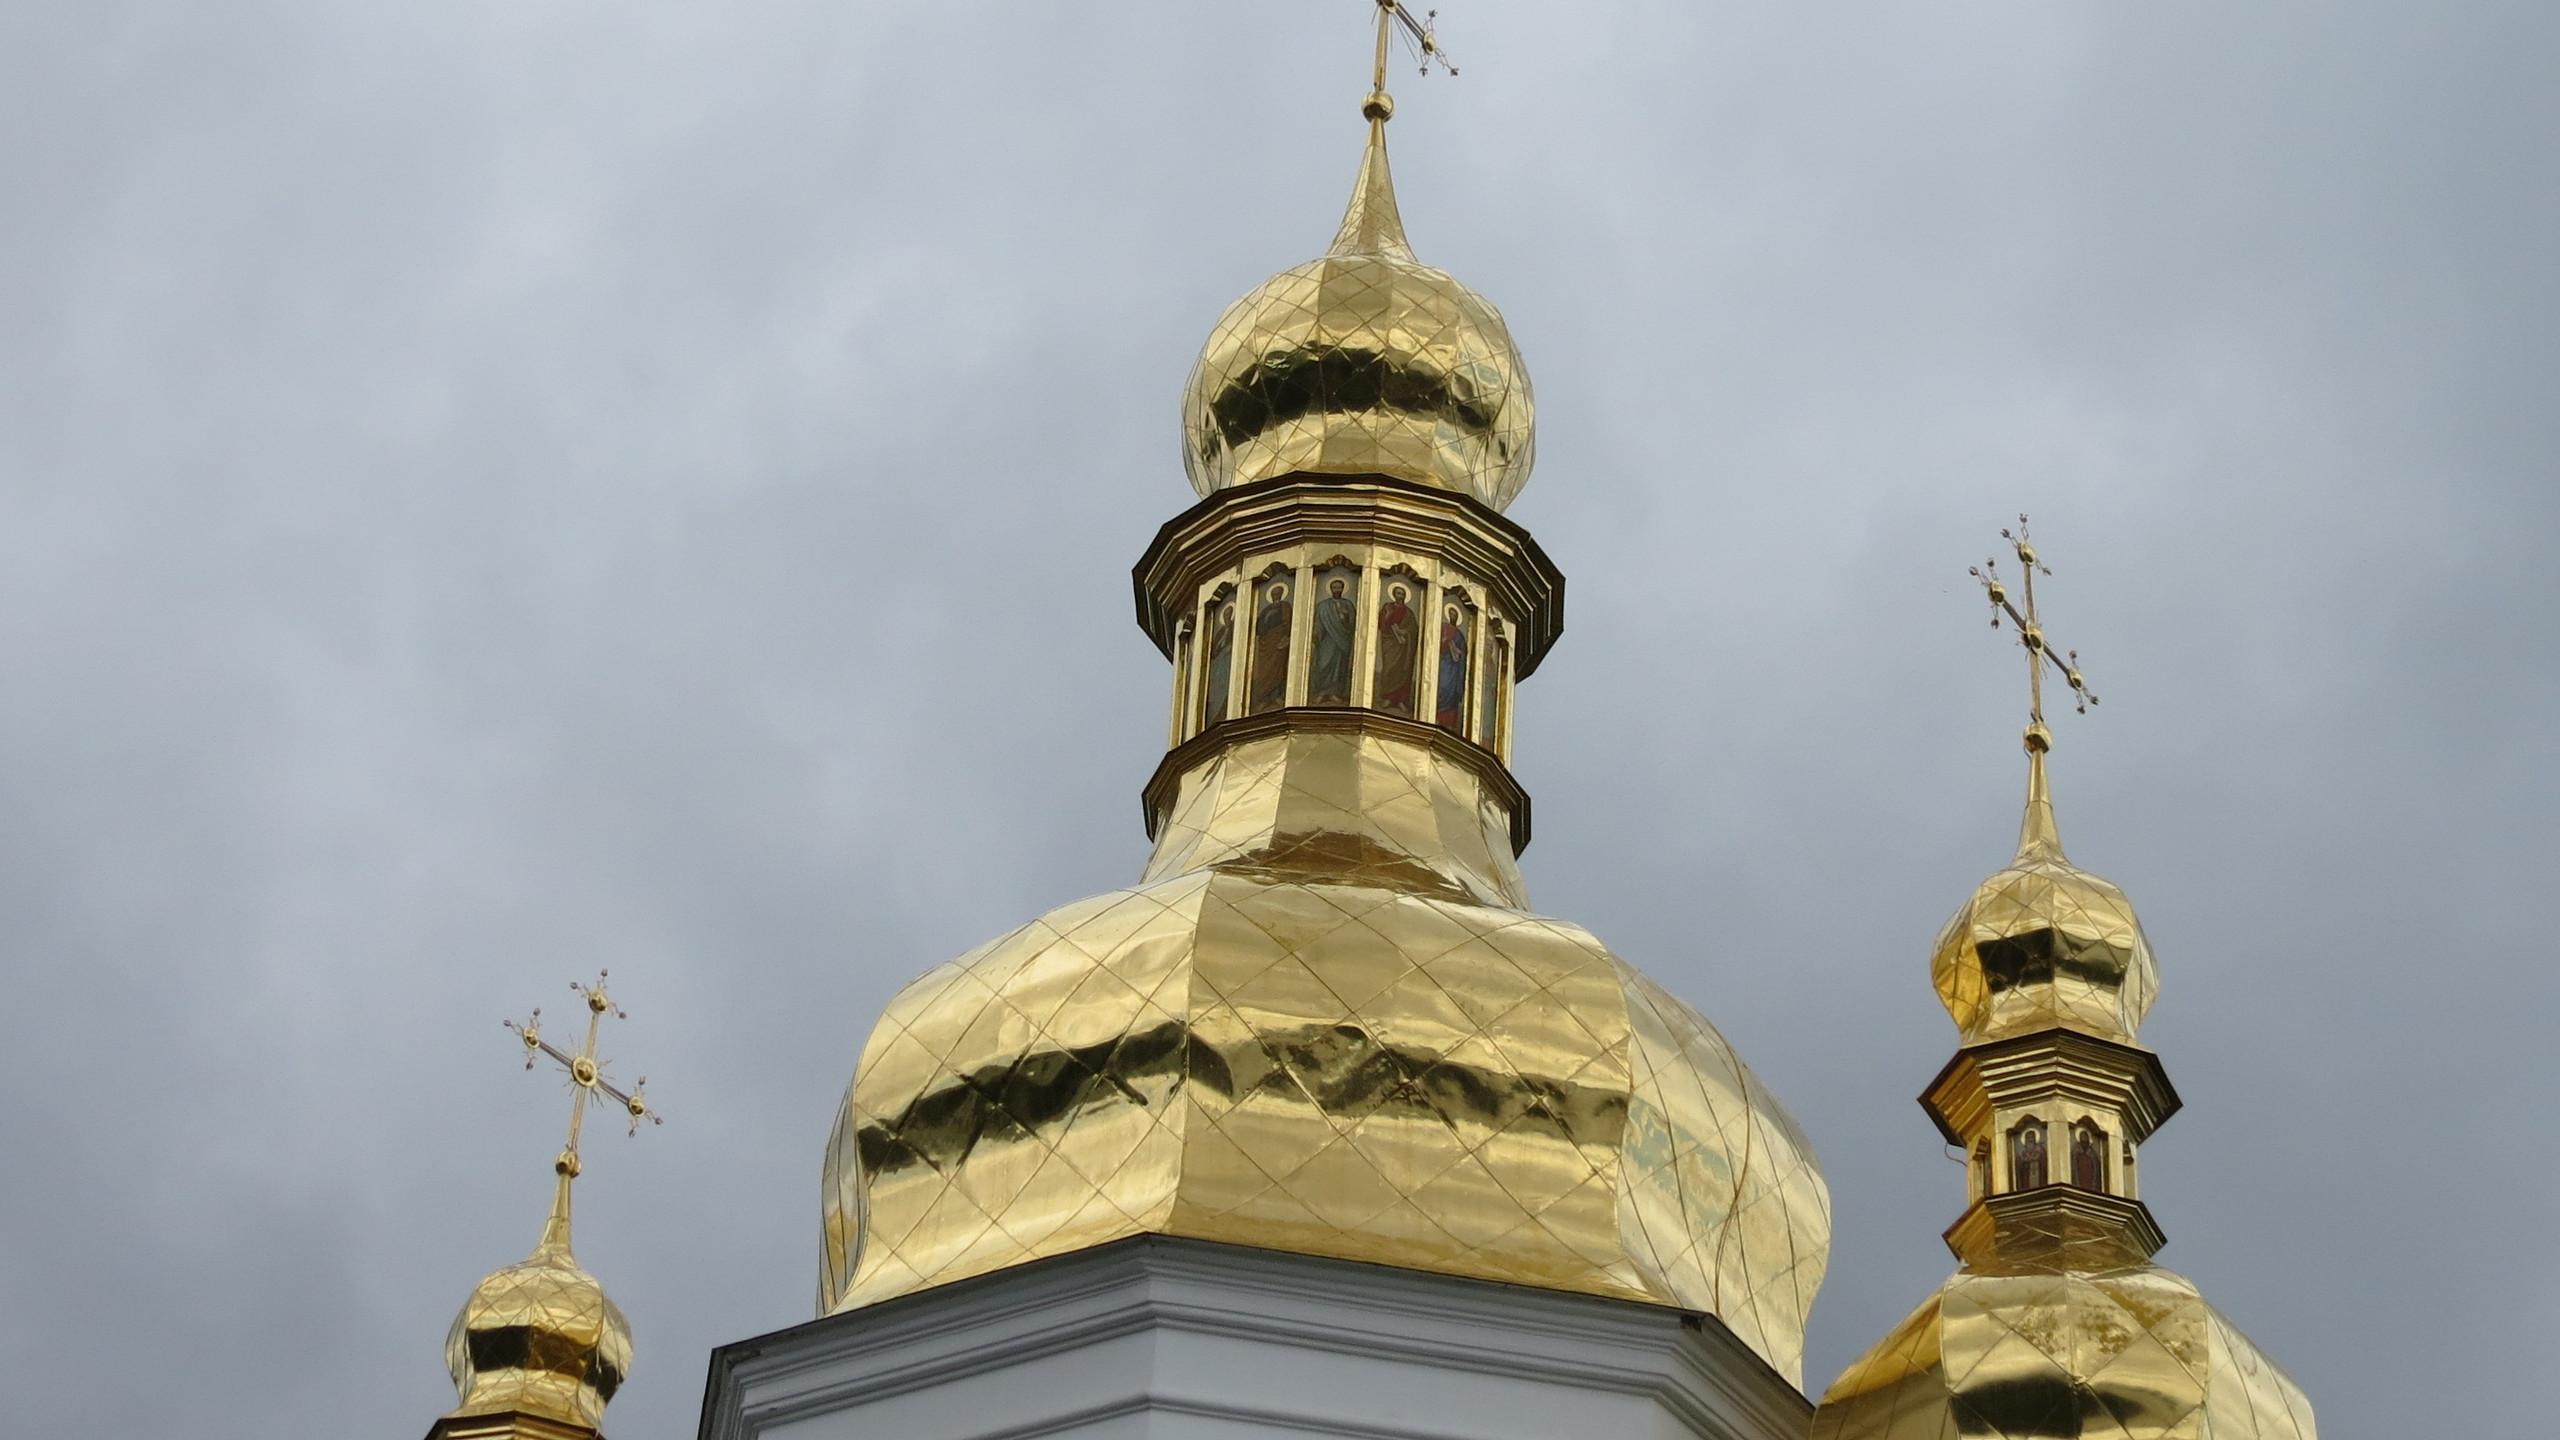 335 - Lavra, Kyiv